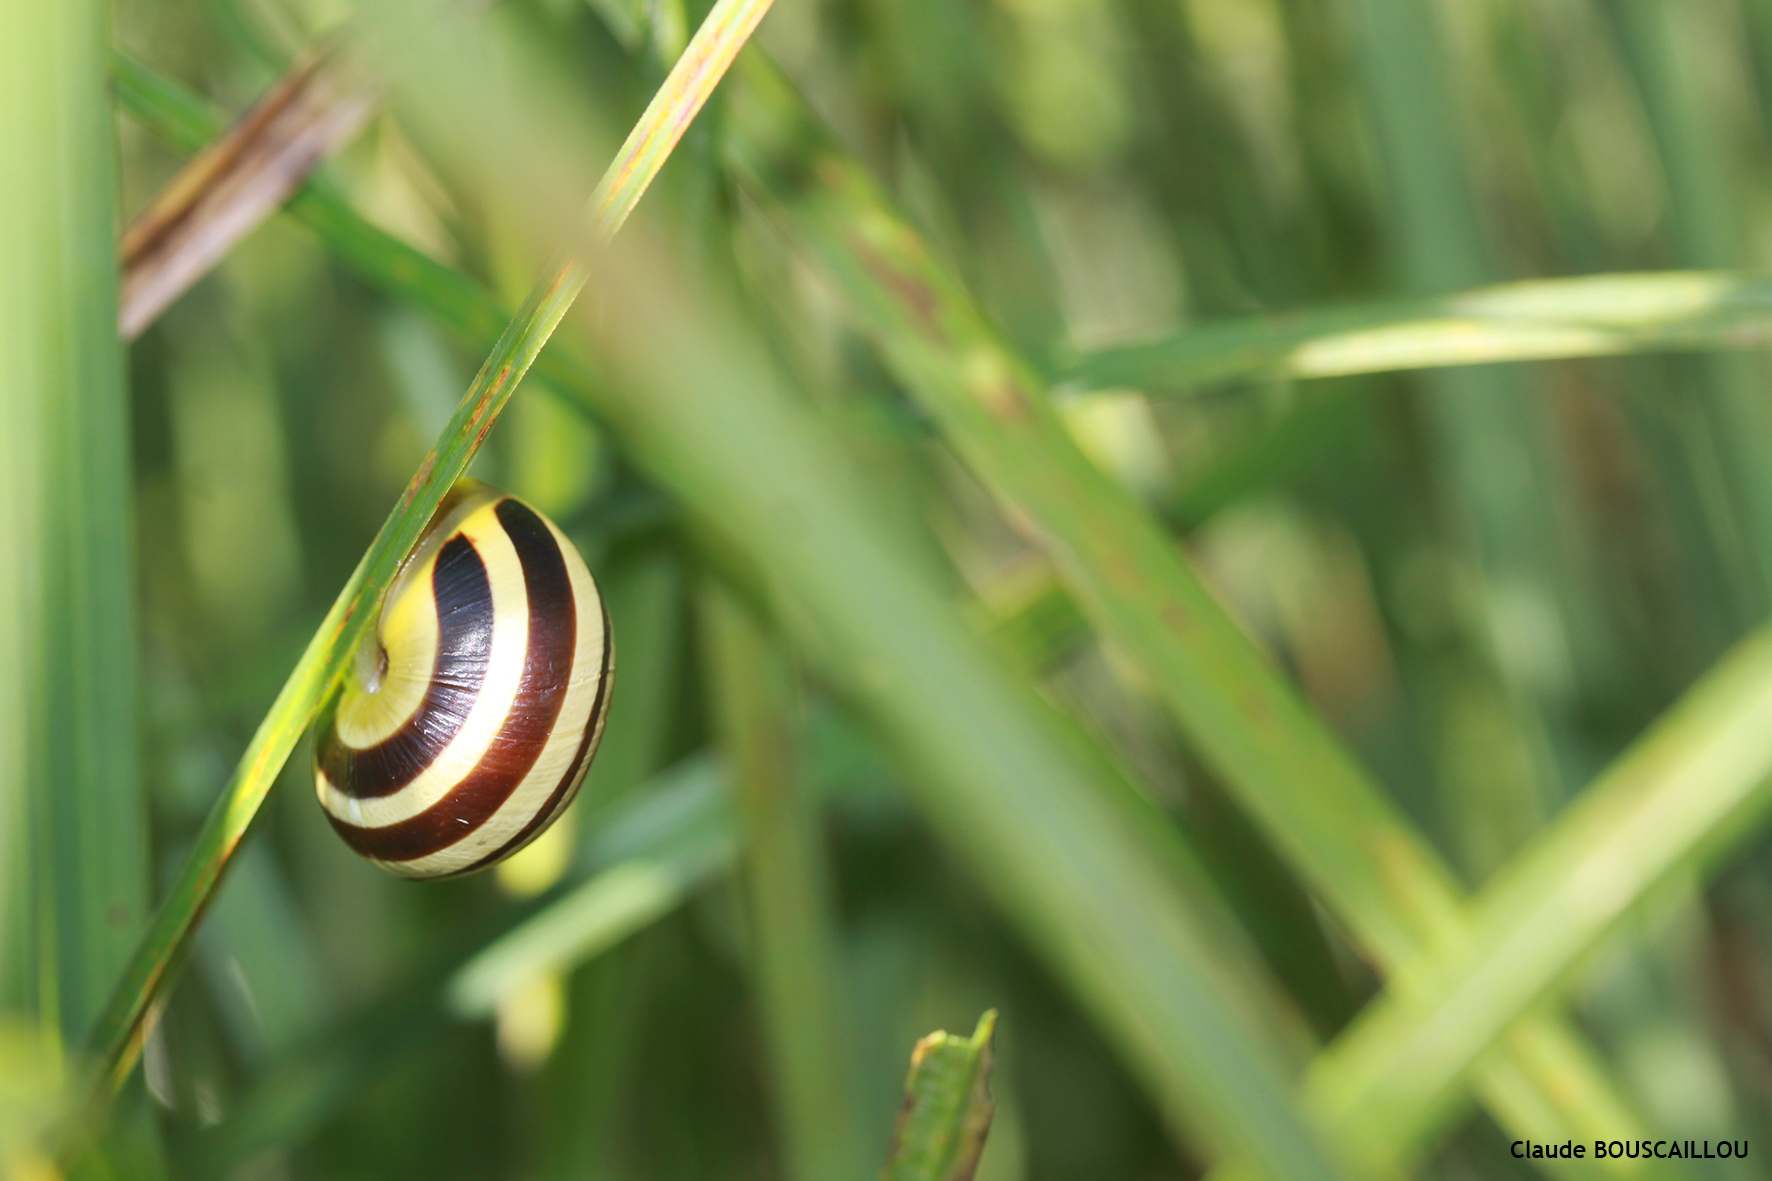 https://cdnfiles1.biolovision.net/www.faunegeneve.ch/userfiles/gasteros/Escargotdesjardins-Cepaeahortensis.jpg